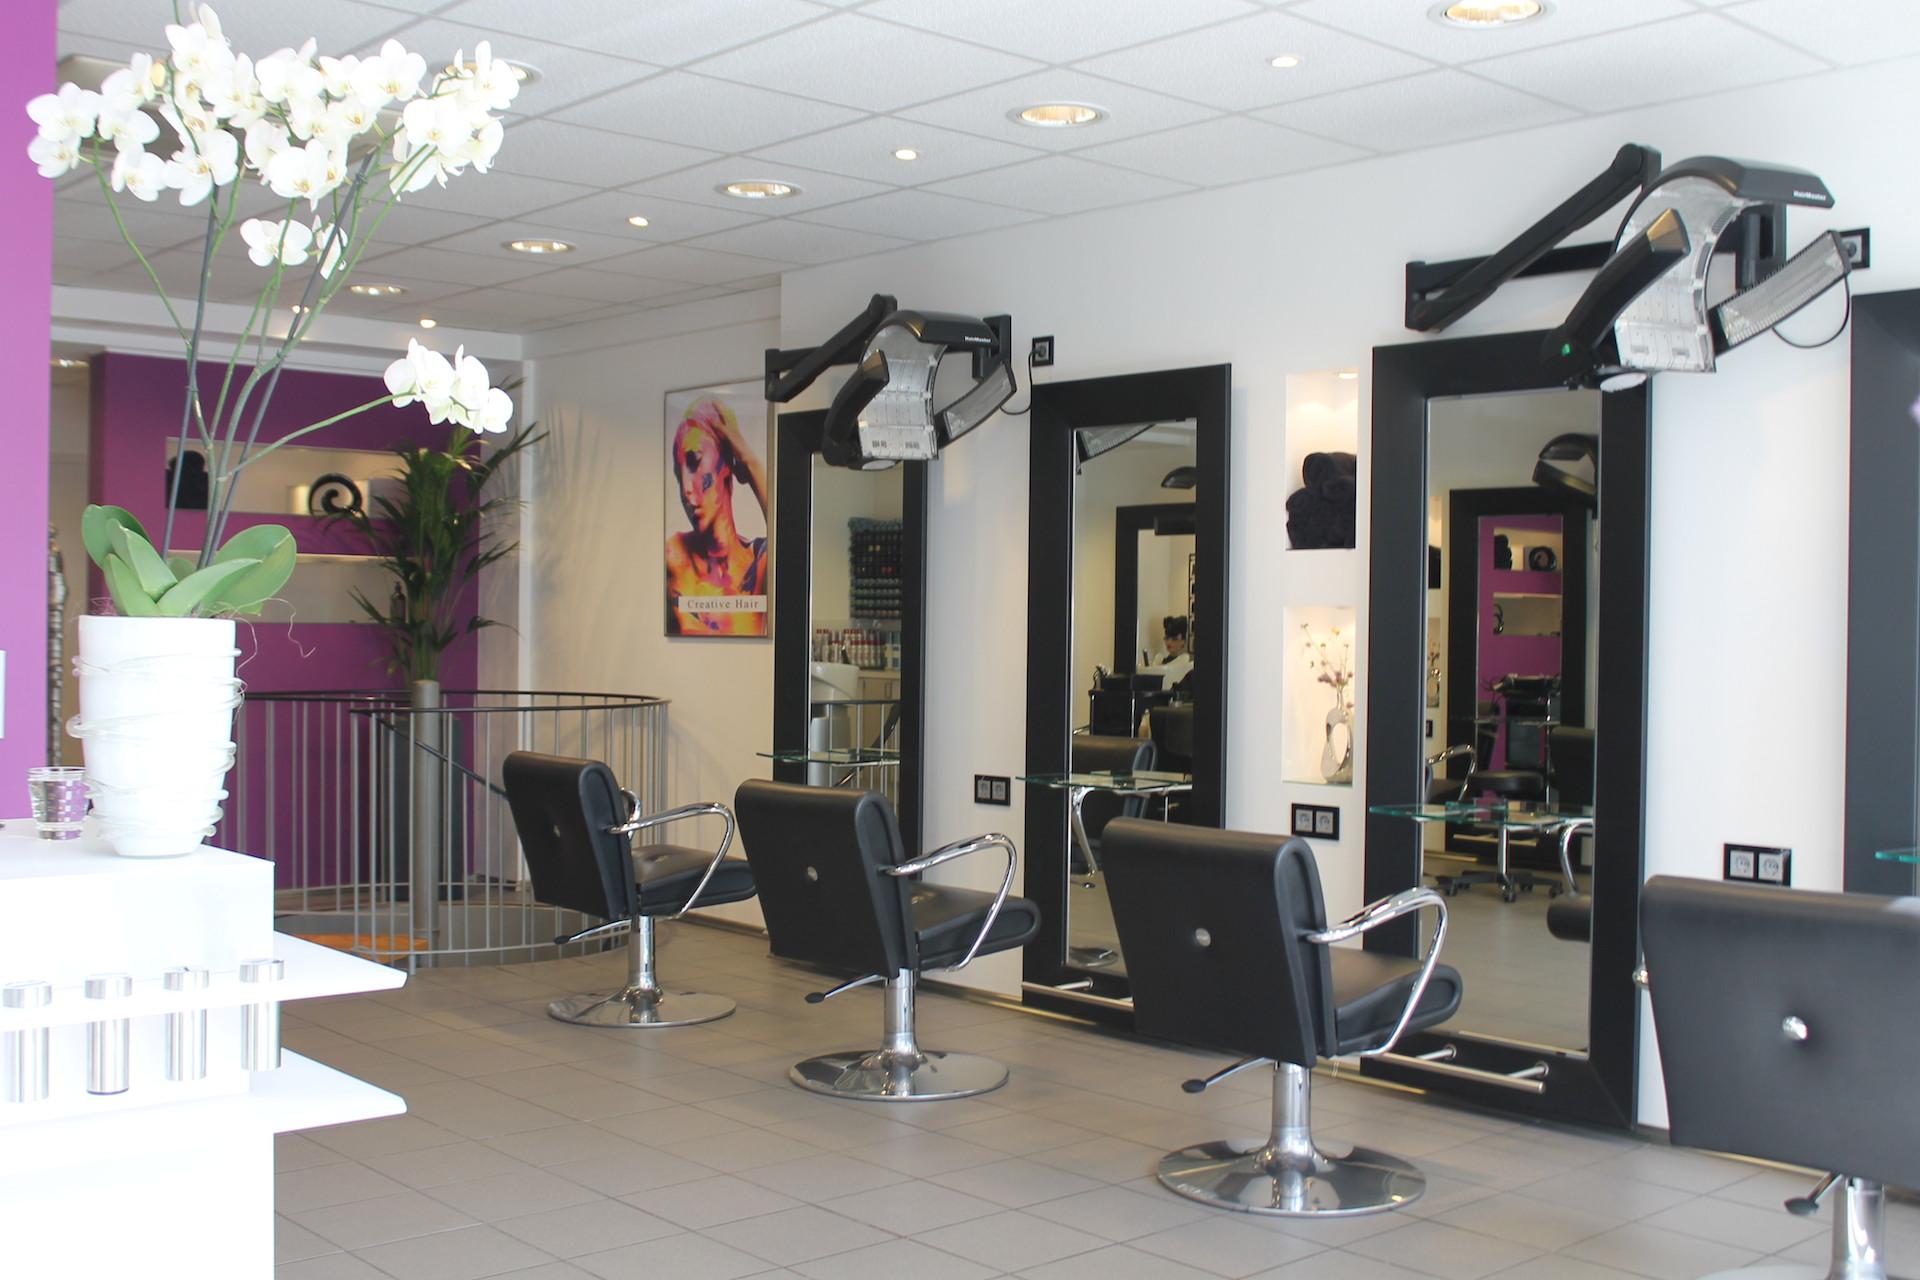 Ladenlokal-Creative-Hair-Meerbusch